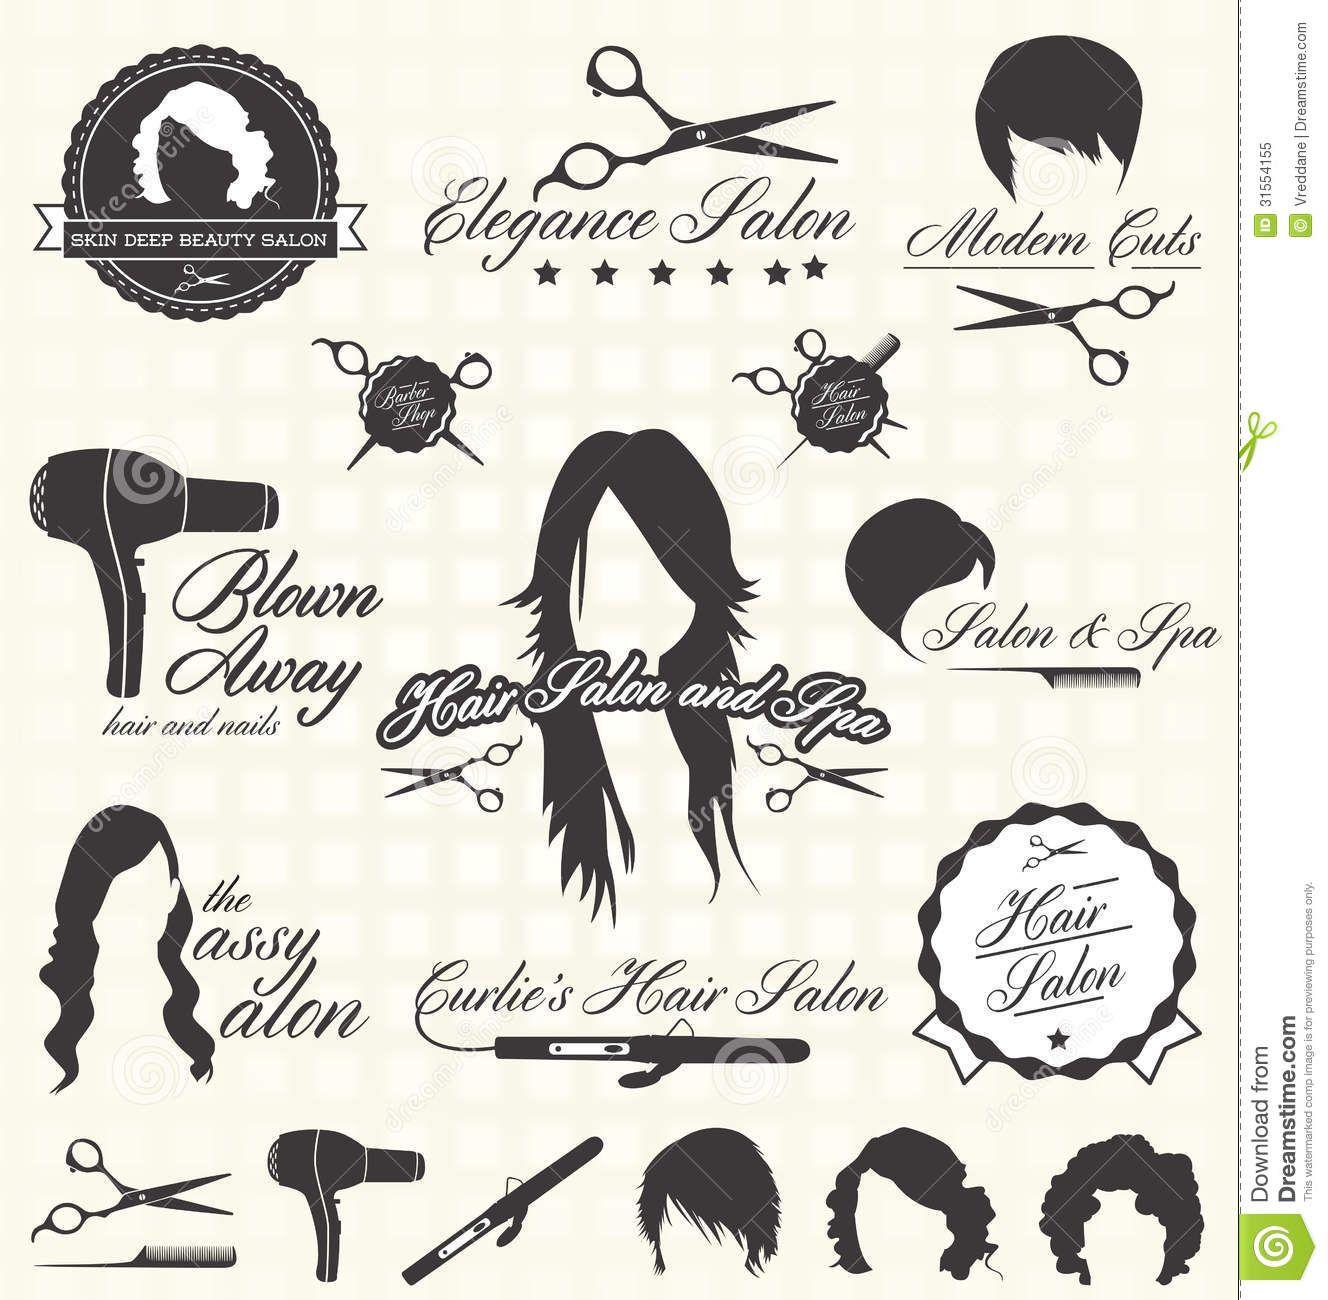 hairdresser graphics Google Search Hair salon, Salons